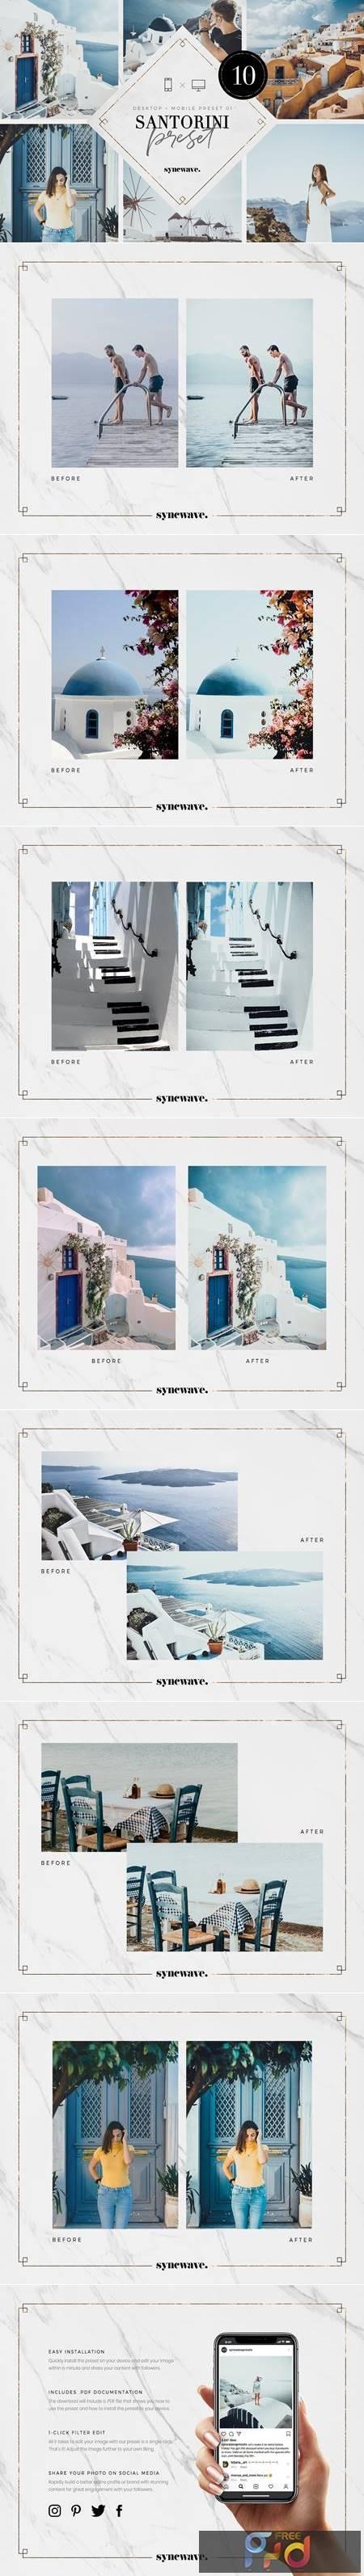 Santorini Lightroom Presets Bundle 5251203 1